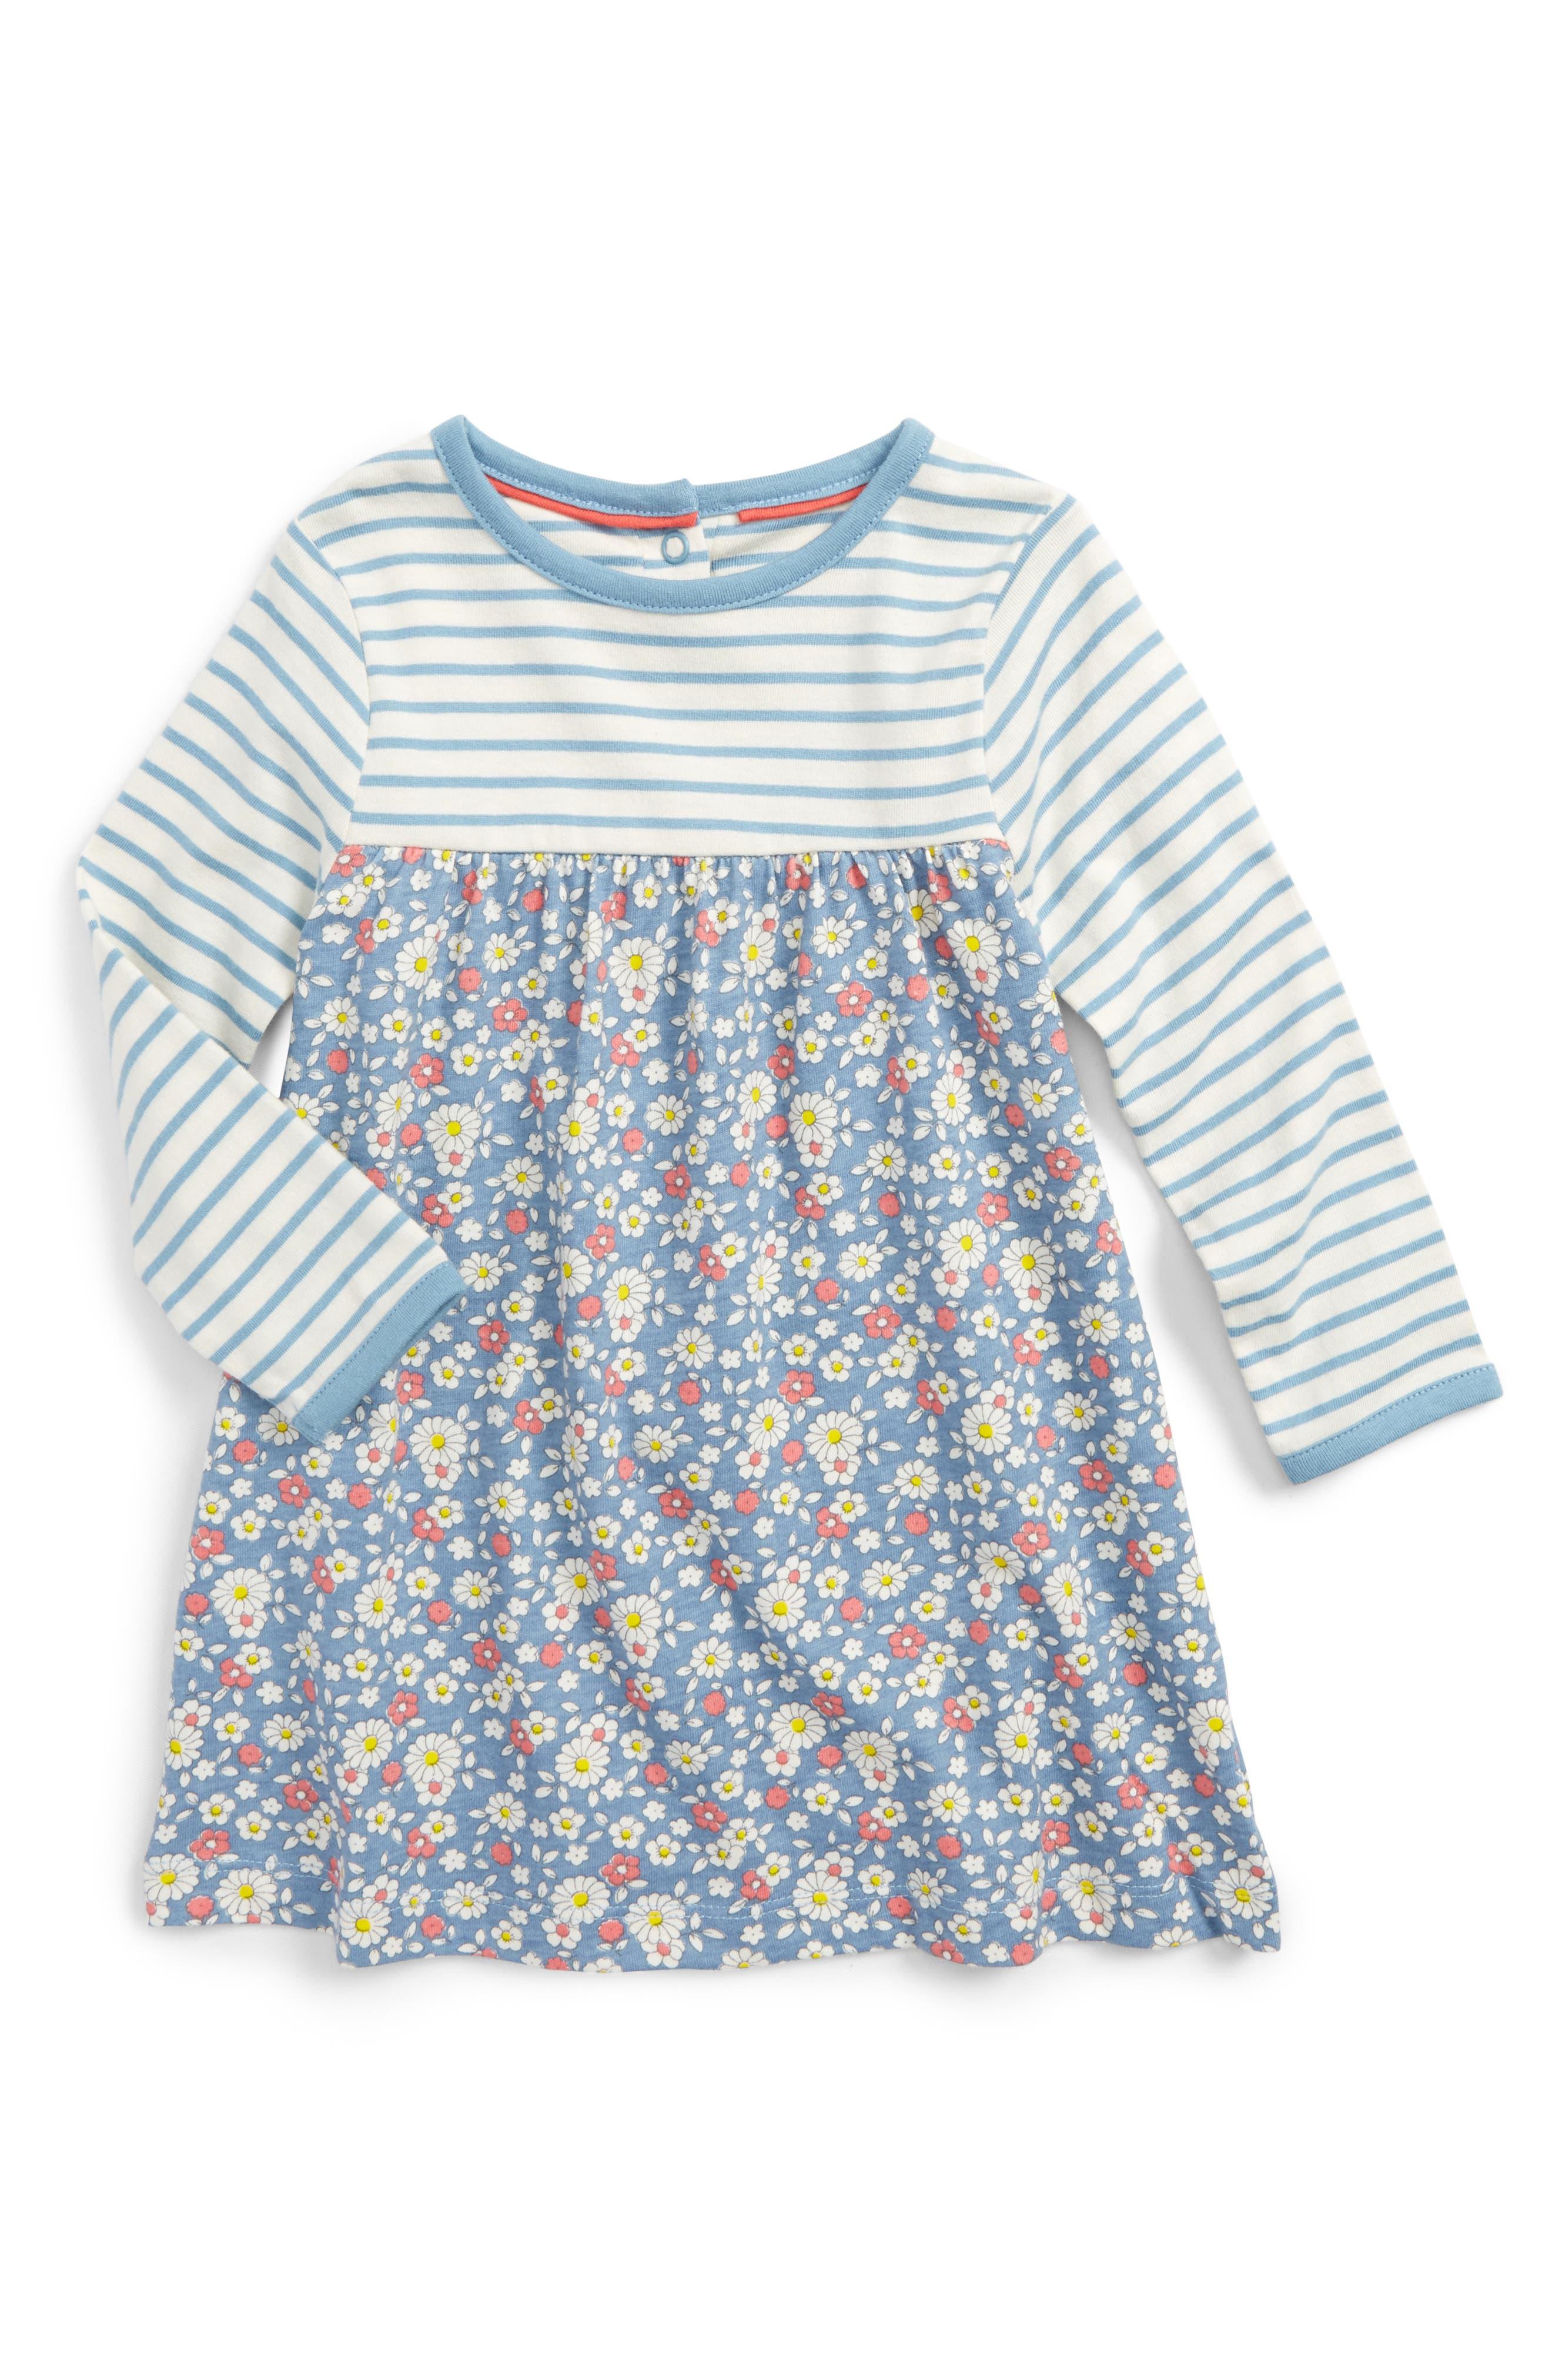 Hotchpotch Dress,                             Main thumbnail 1, color,                             Blue Wren Vintage Daisy